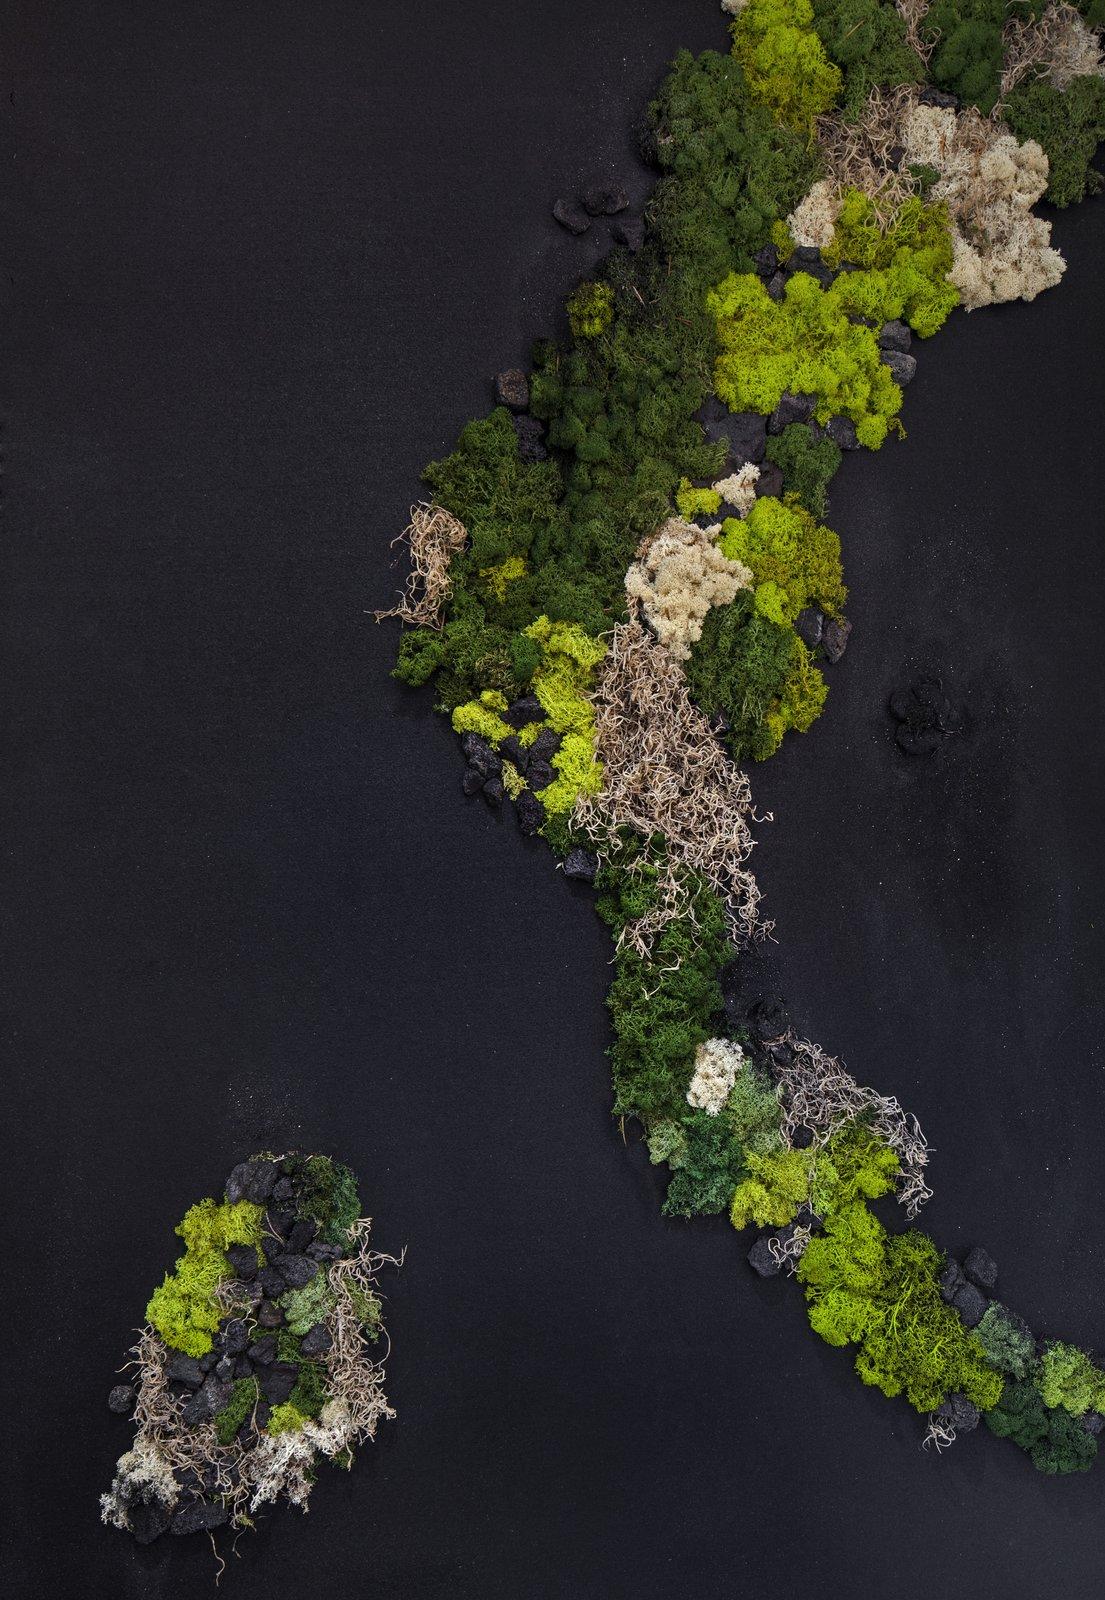 Living Moss wall in powder room created by Minarc.  Dawnsknoll by Minarc